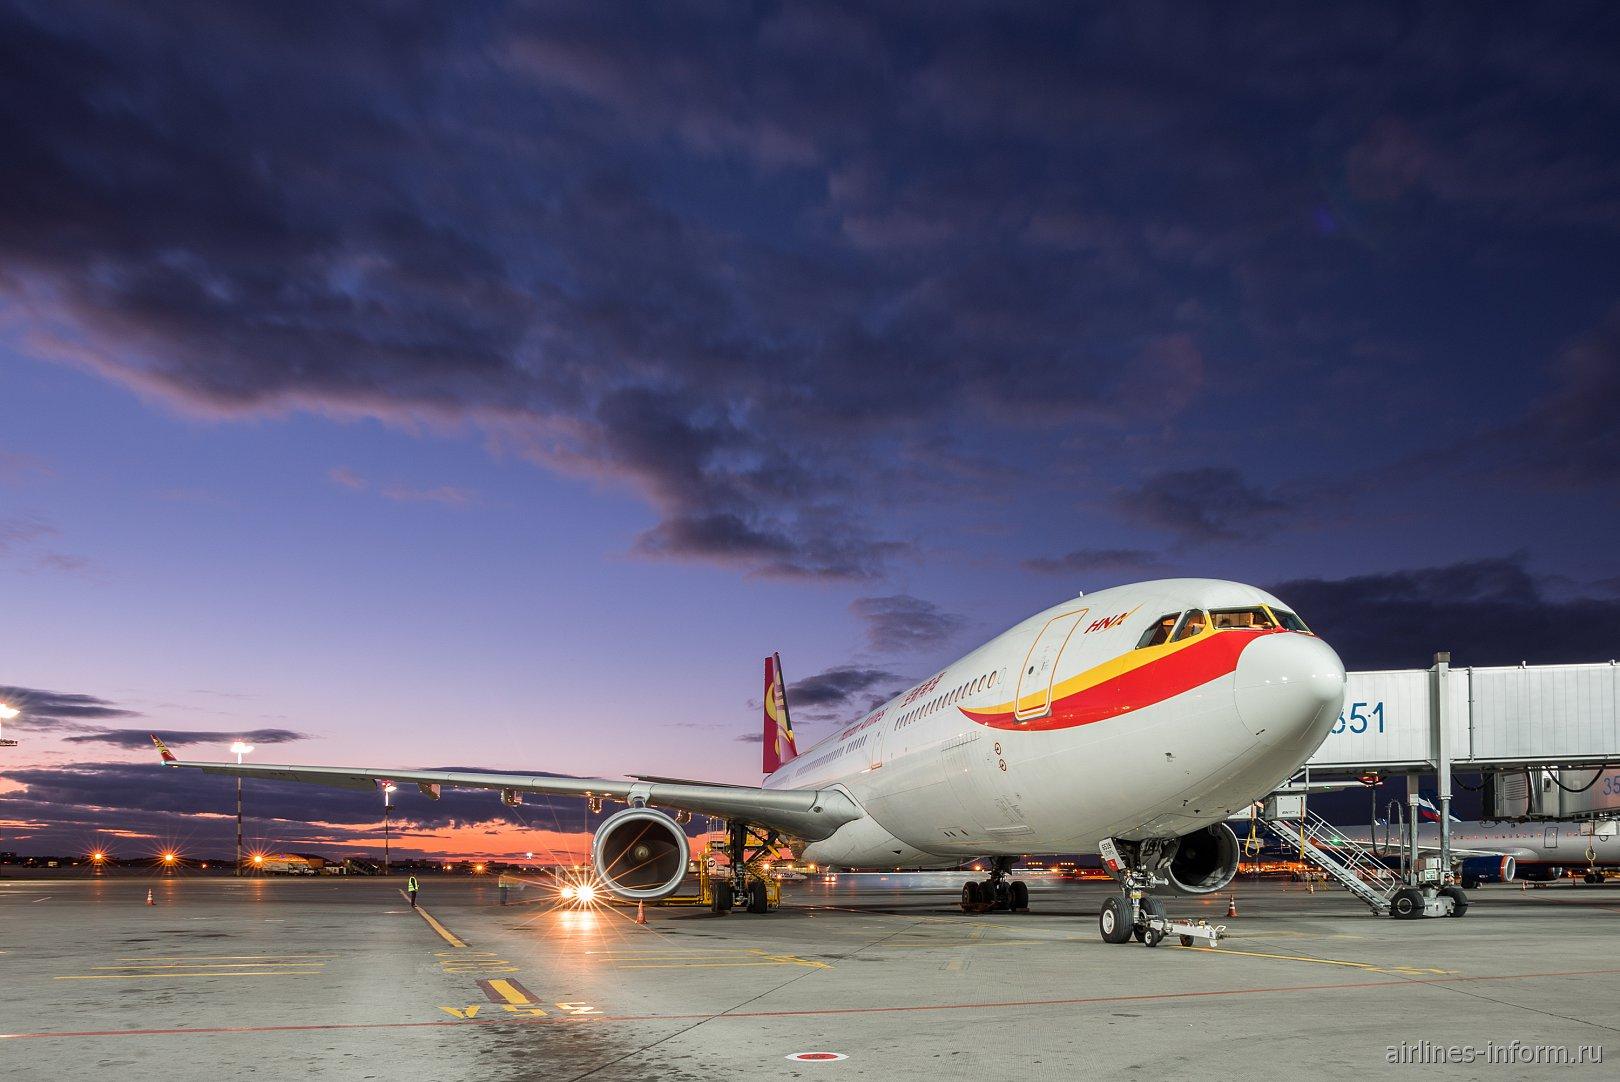 Airbus A330-300 Hainan Airlines в аэропорту Шереметьево у терминала Е